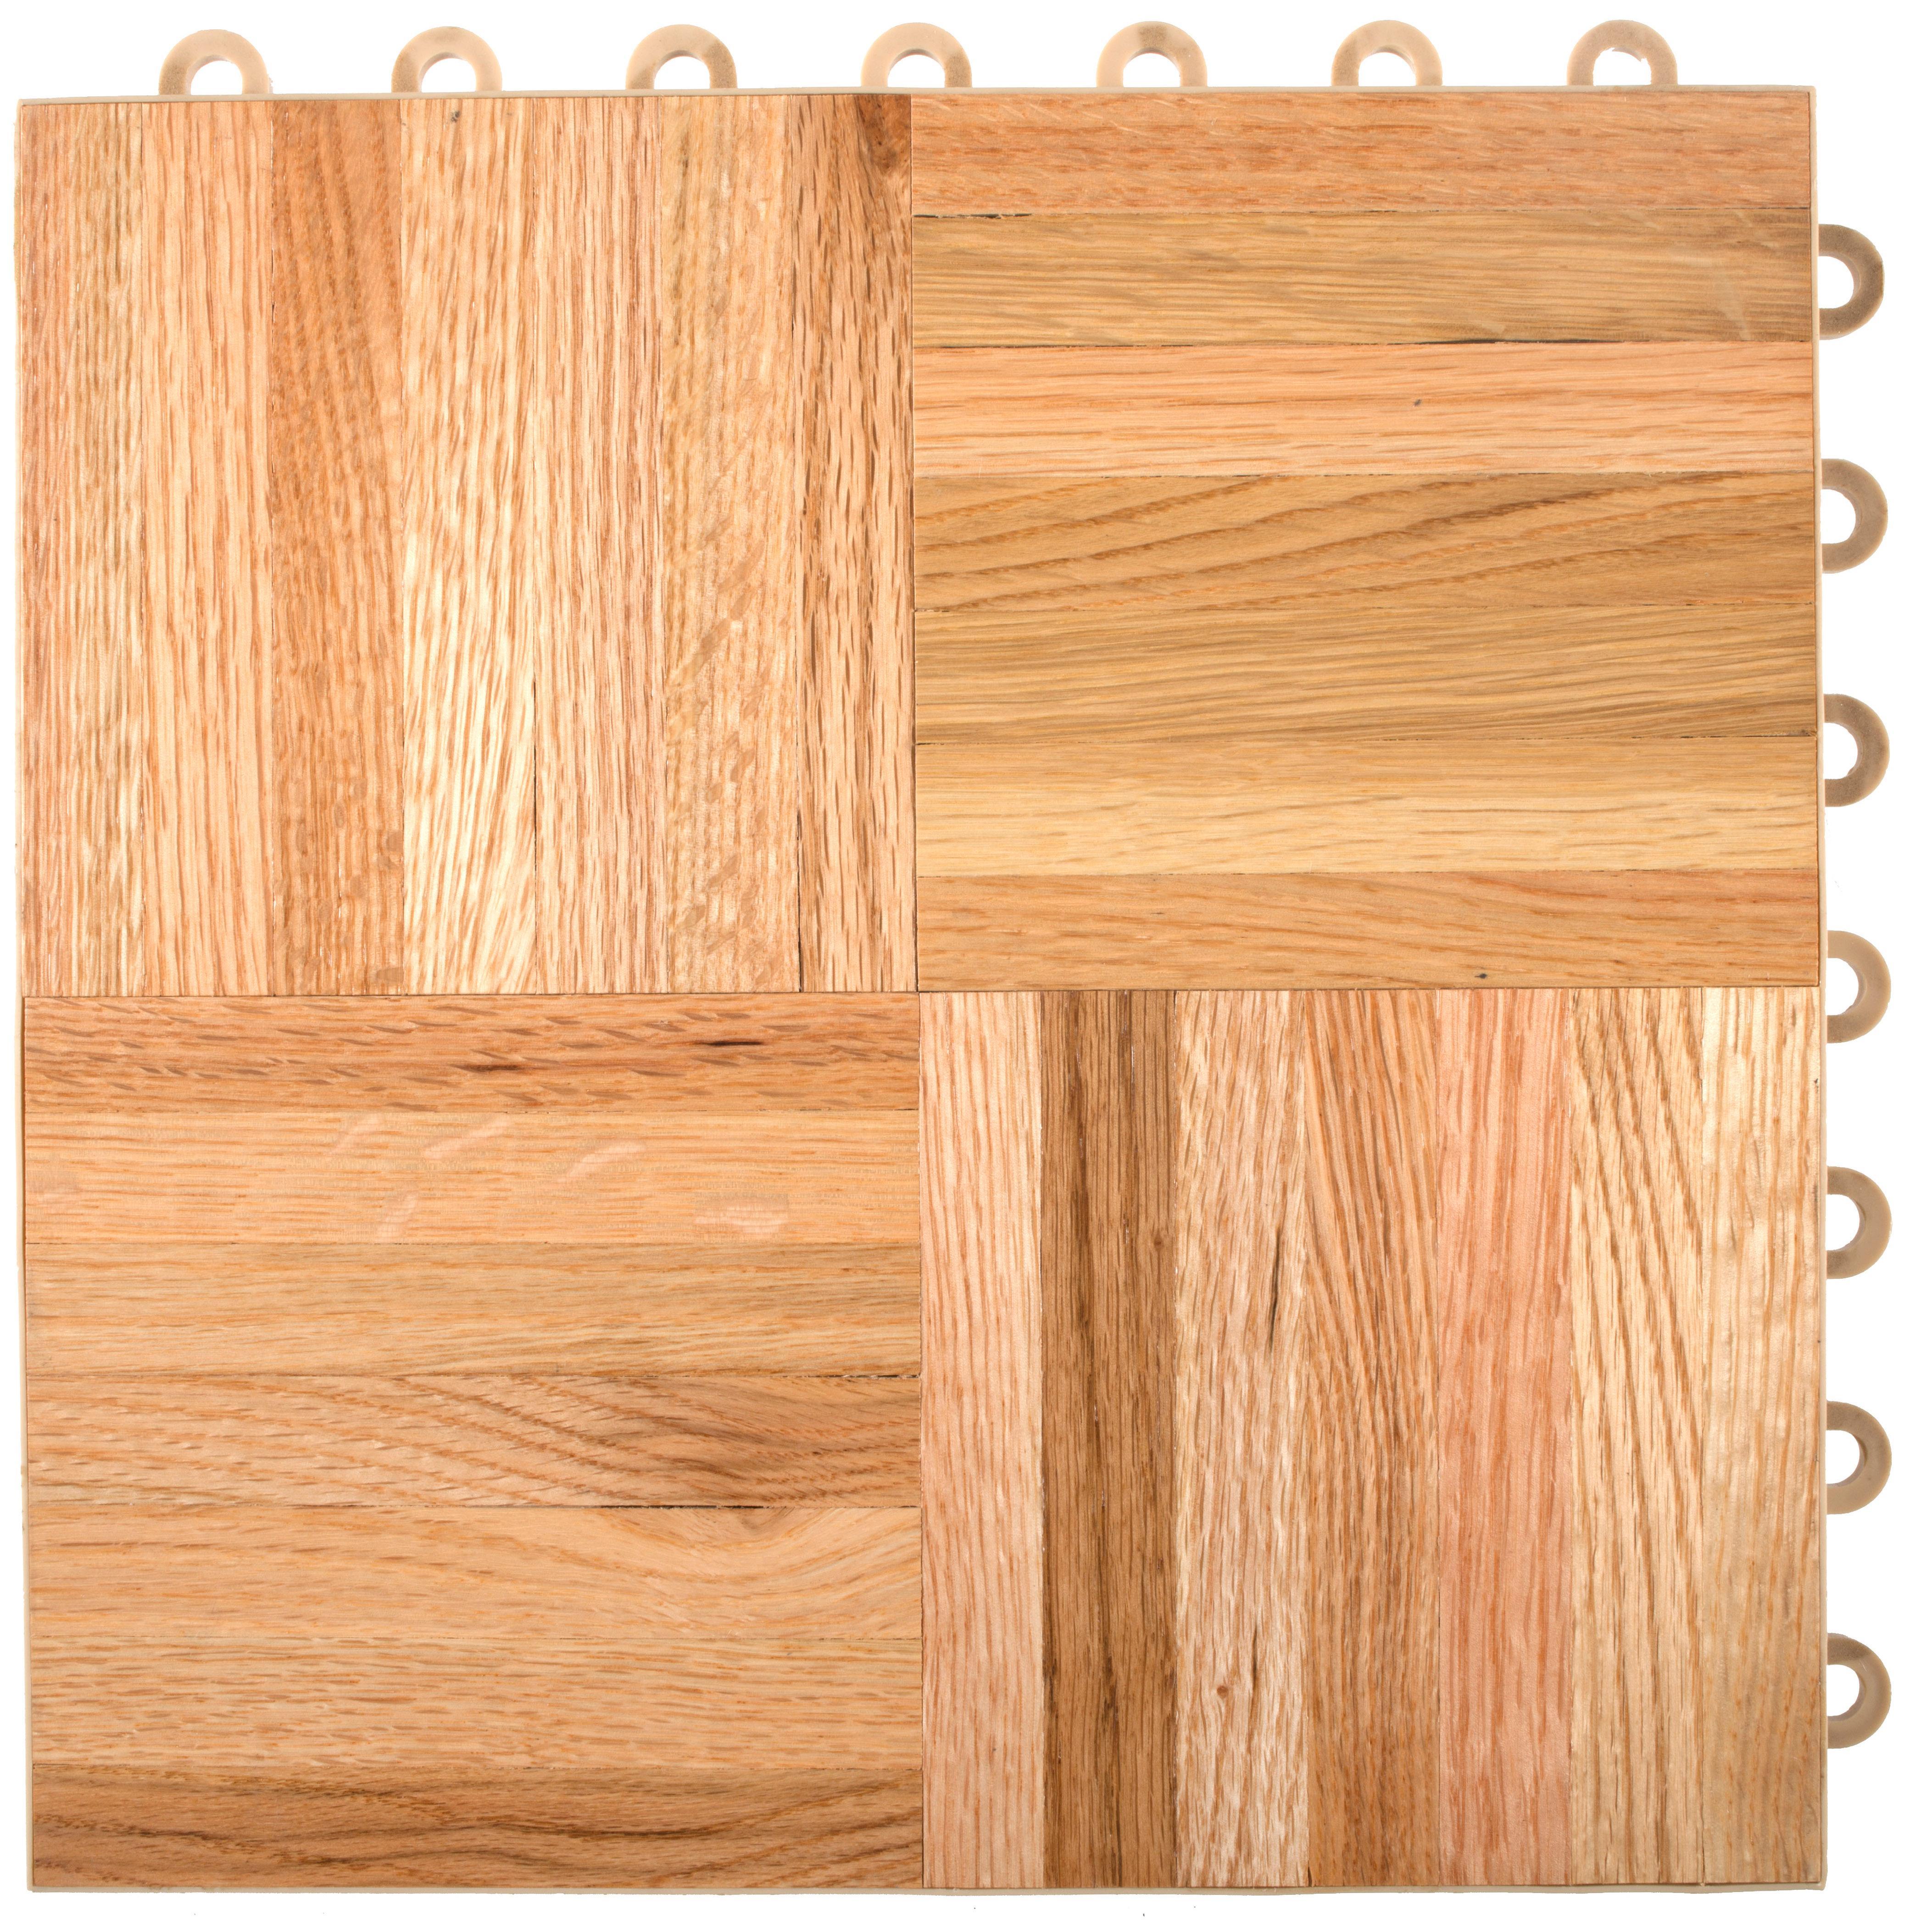 teakbali flooring deck floor home components teak decking bali hardwood